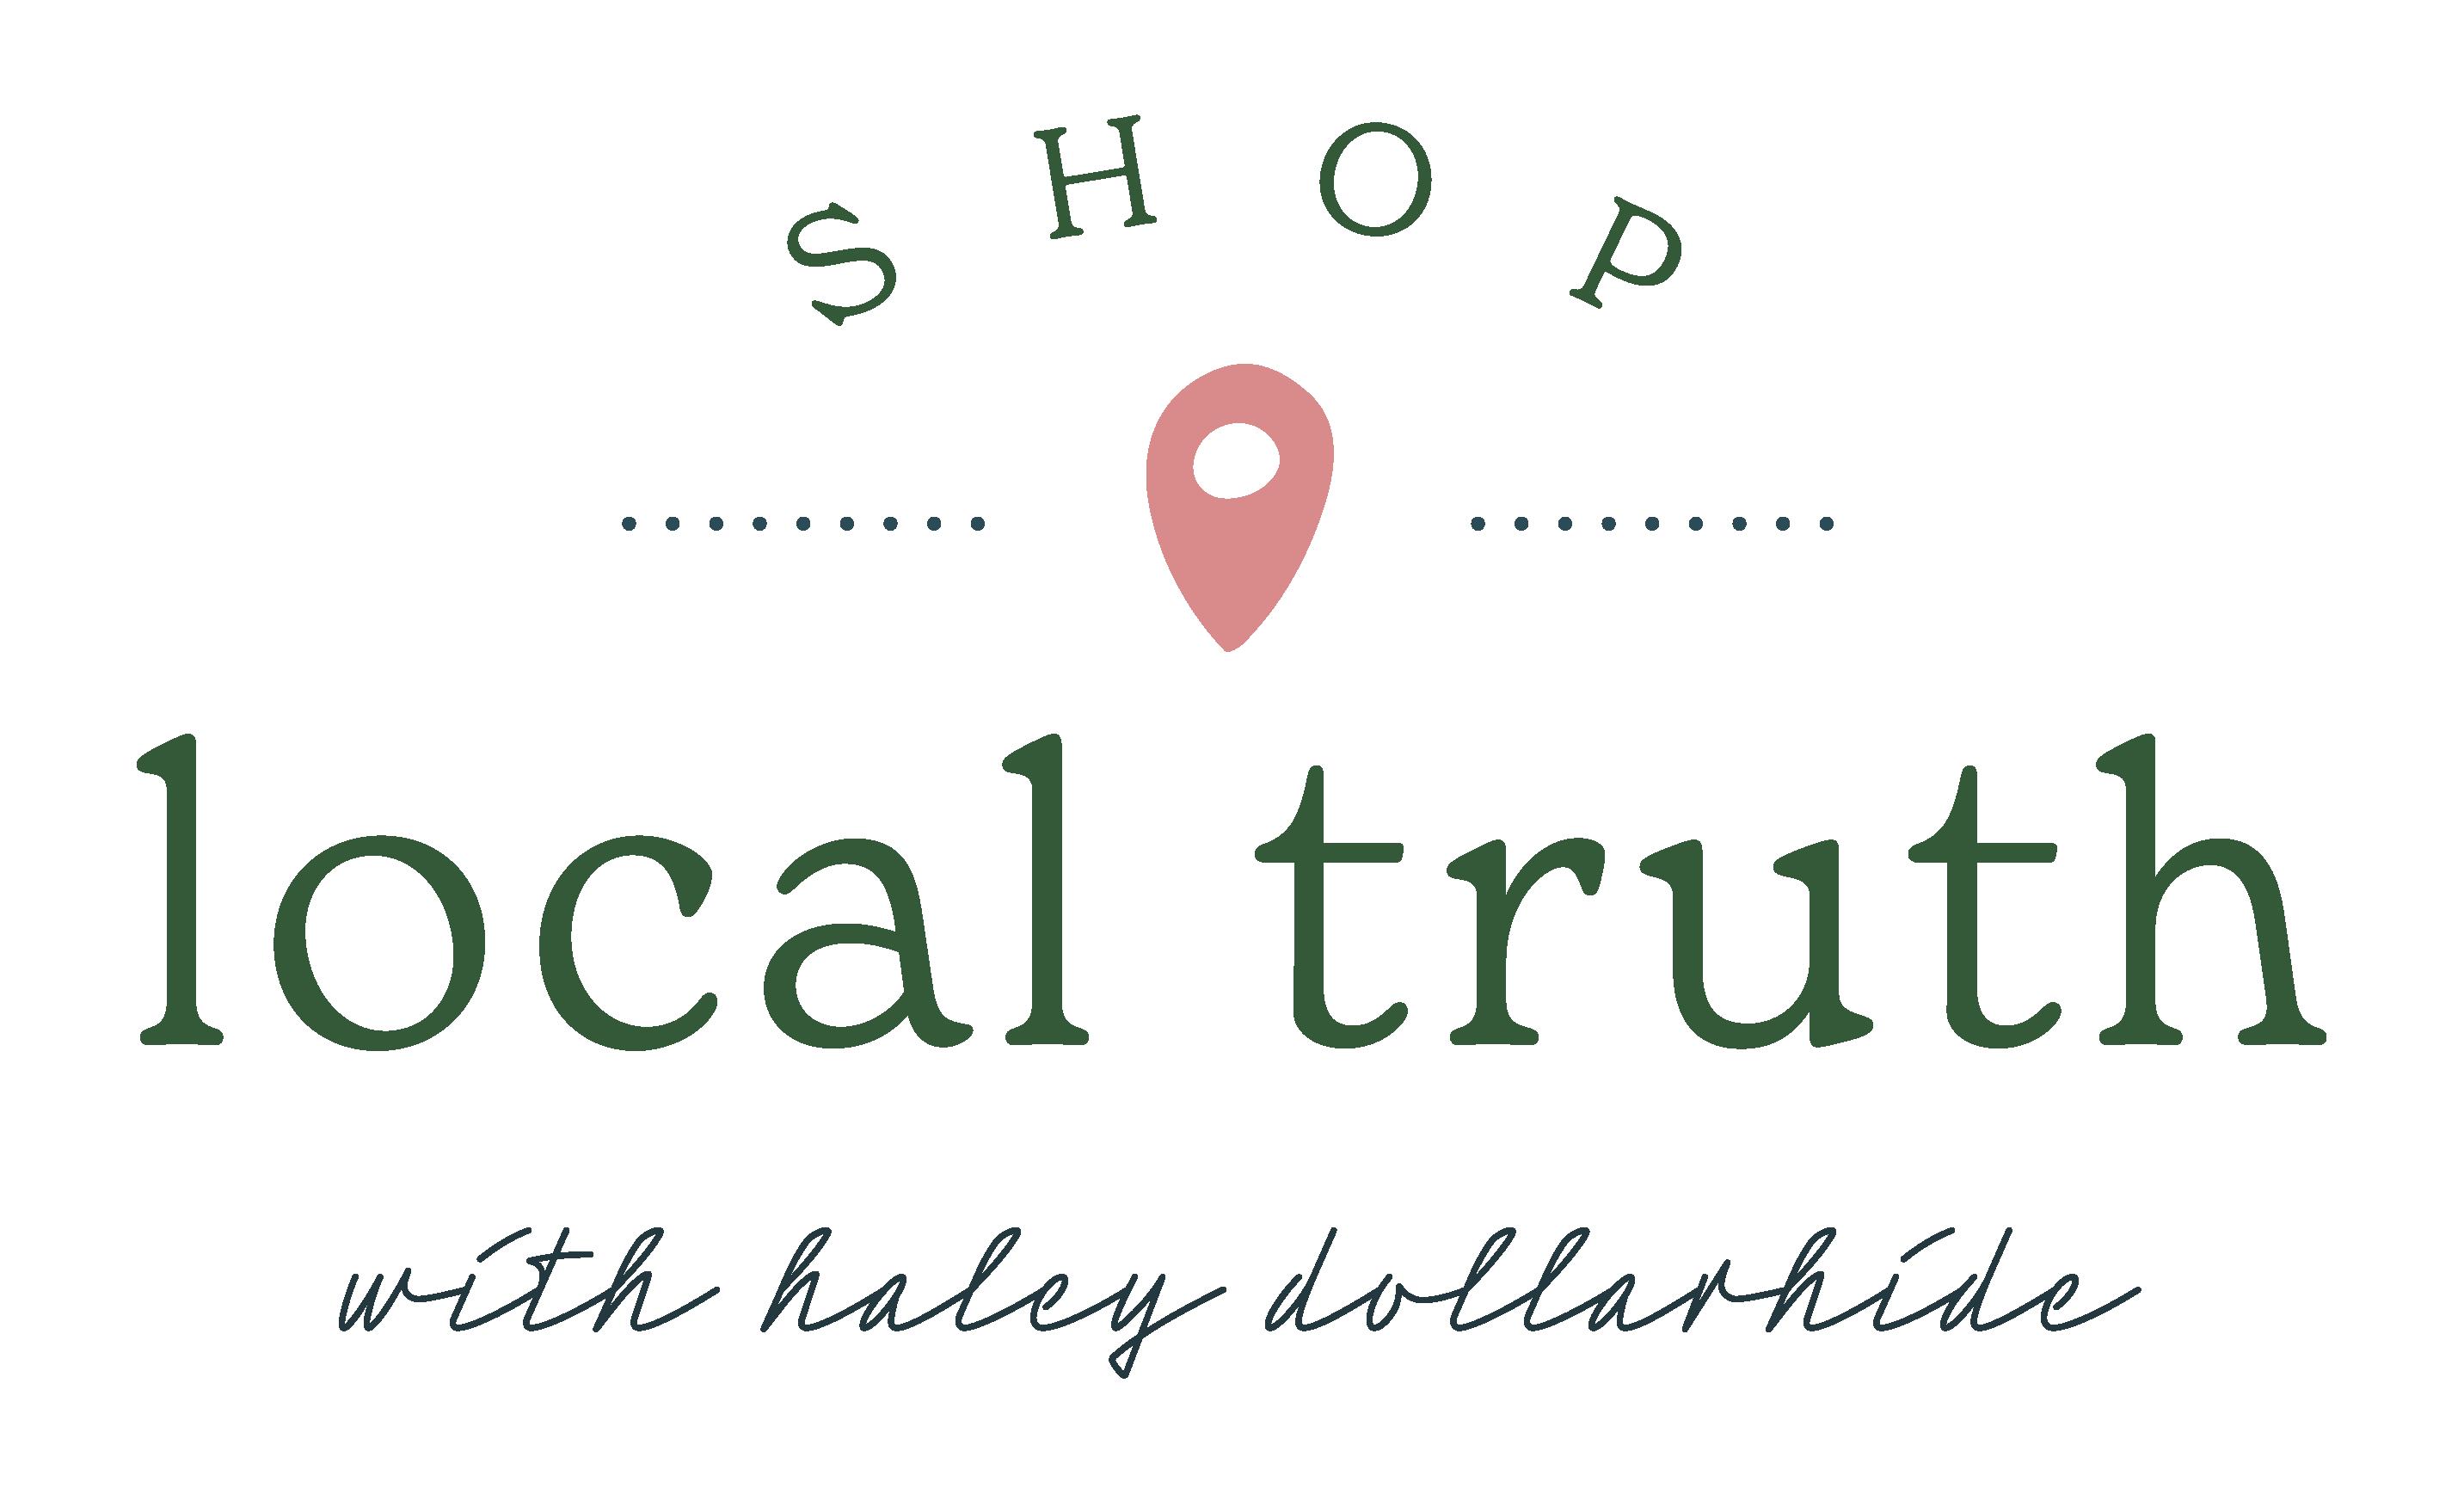 Shop Local Truth